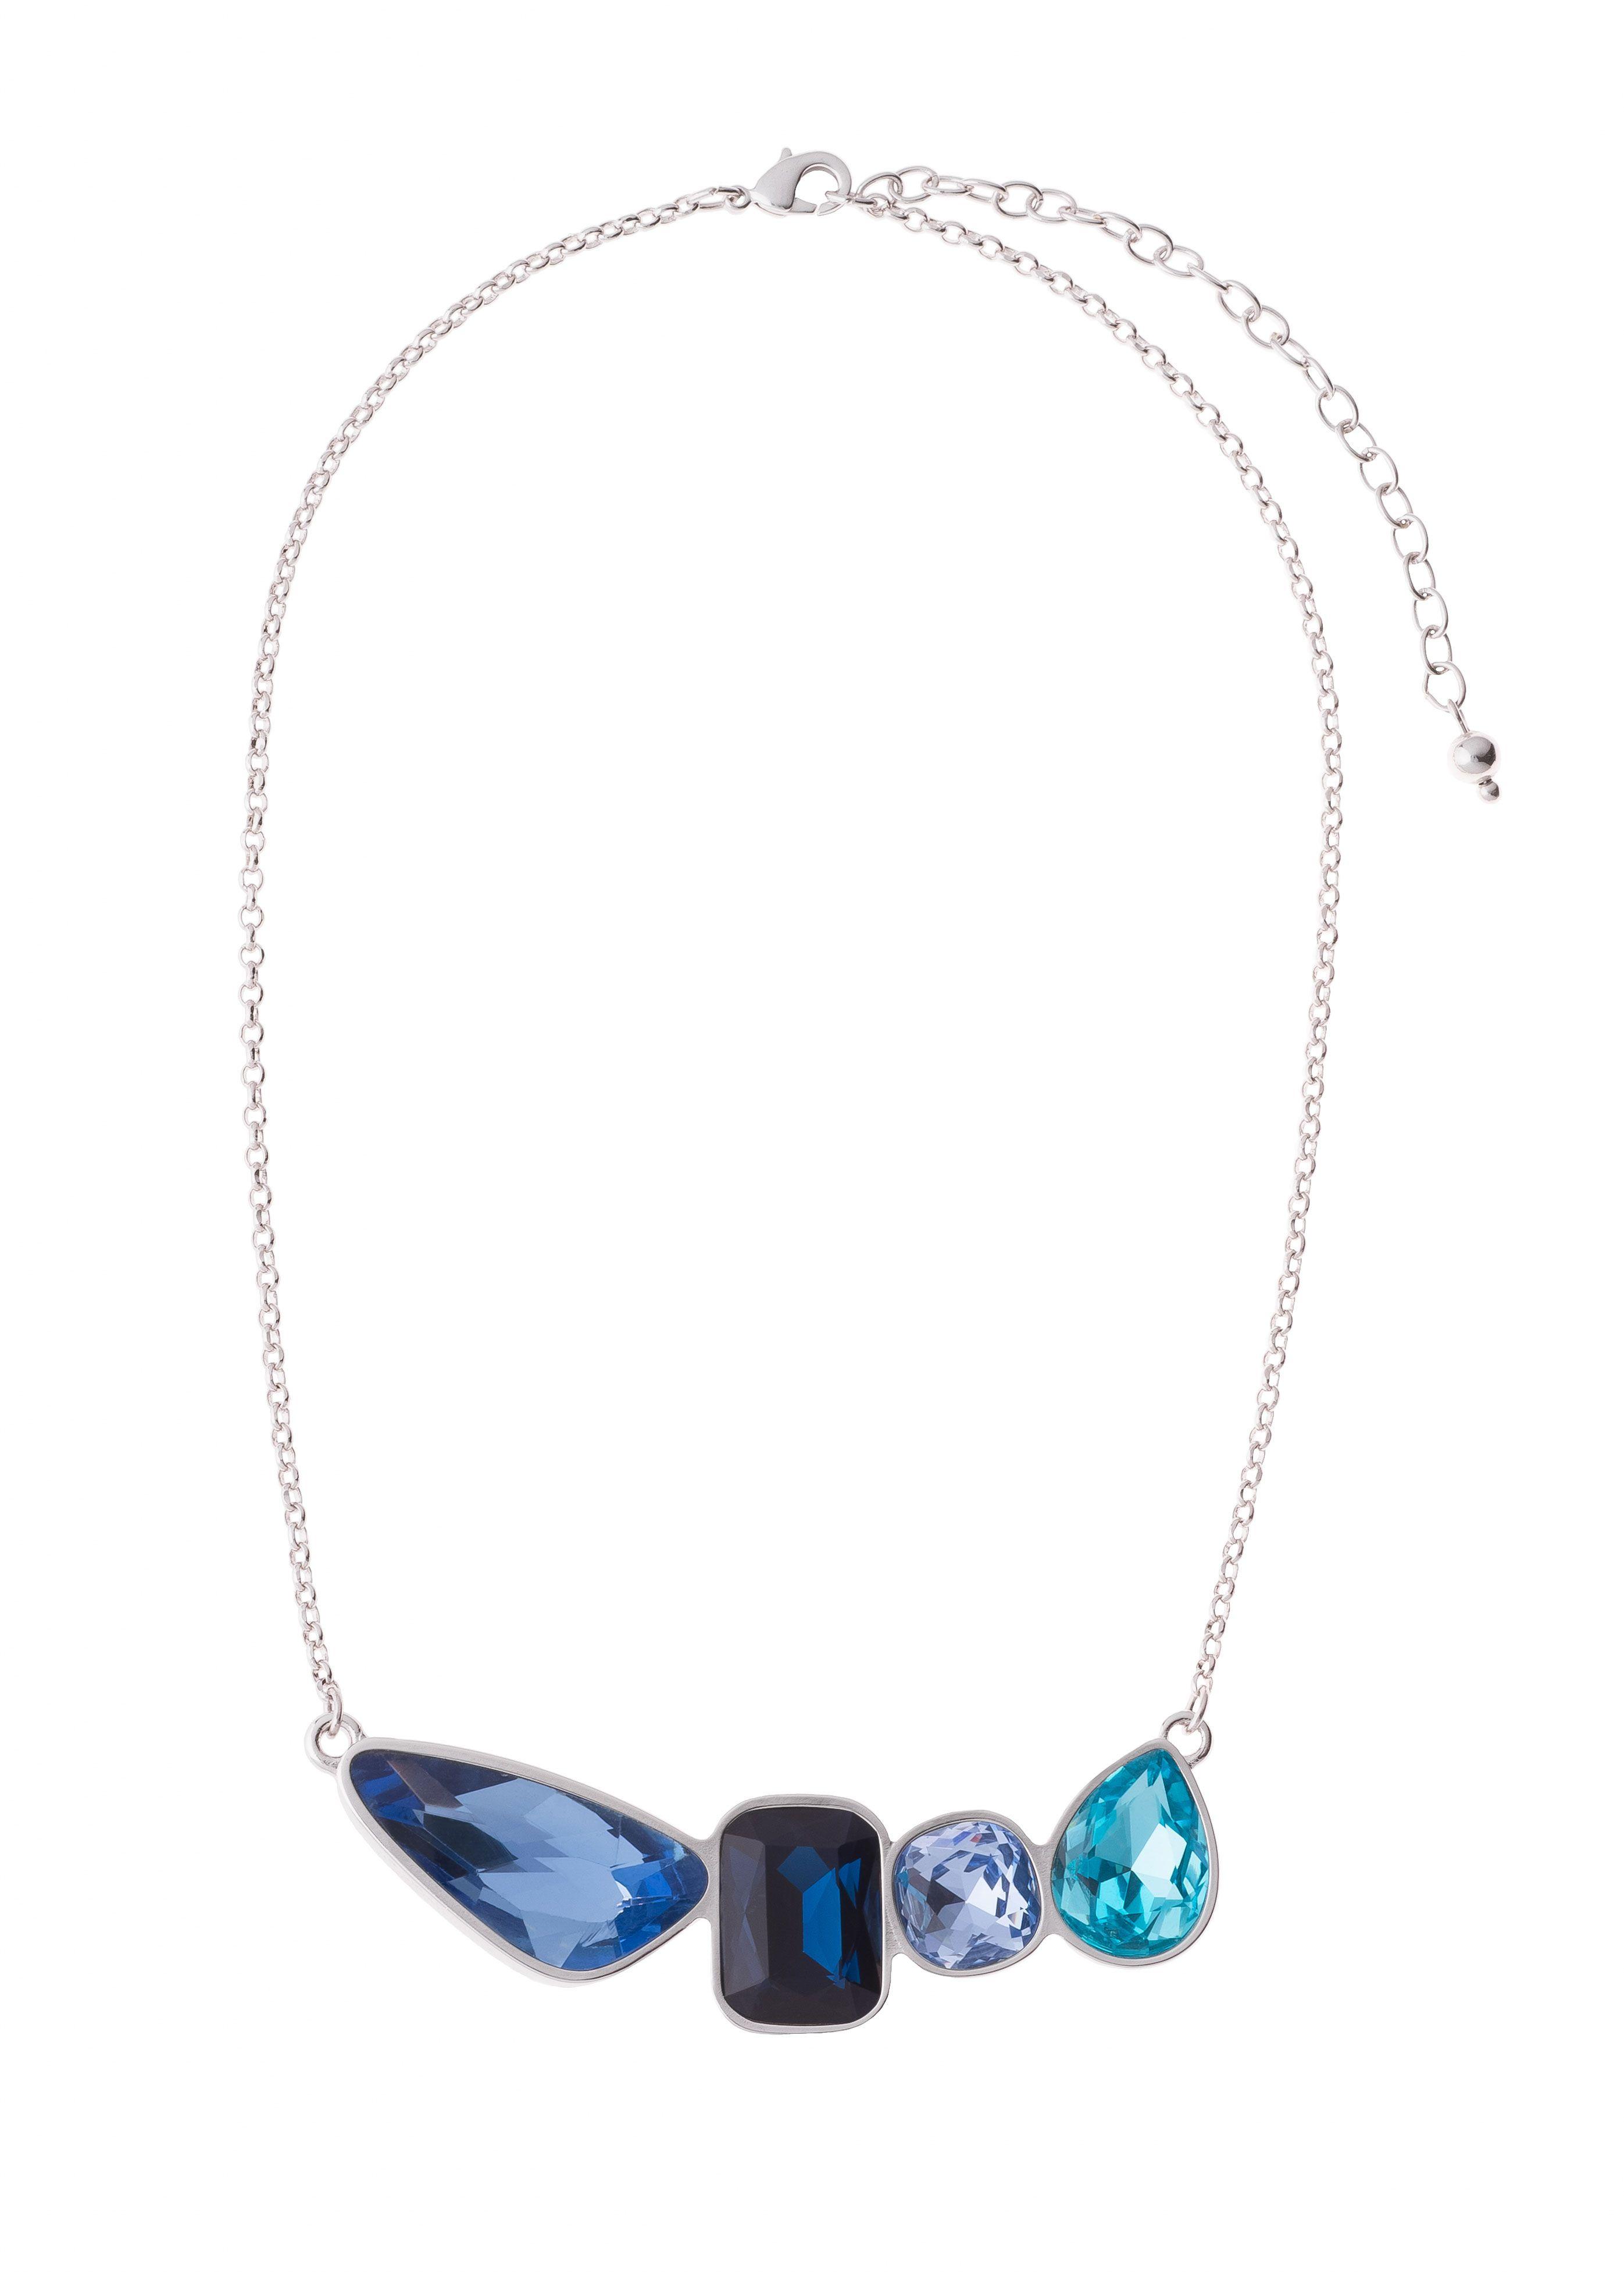 68e08c2c79dd Collar de 42cm de largo y 8cm de extensión. en baño de rodio con piedras en  tonos azules. Collar modelo 317313